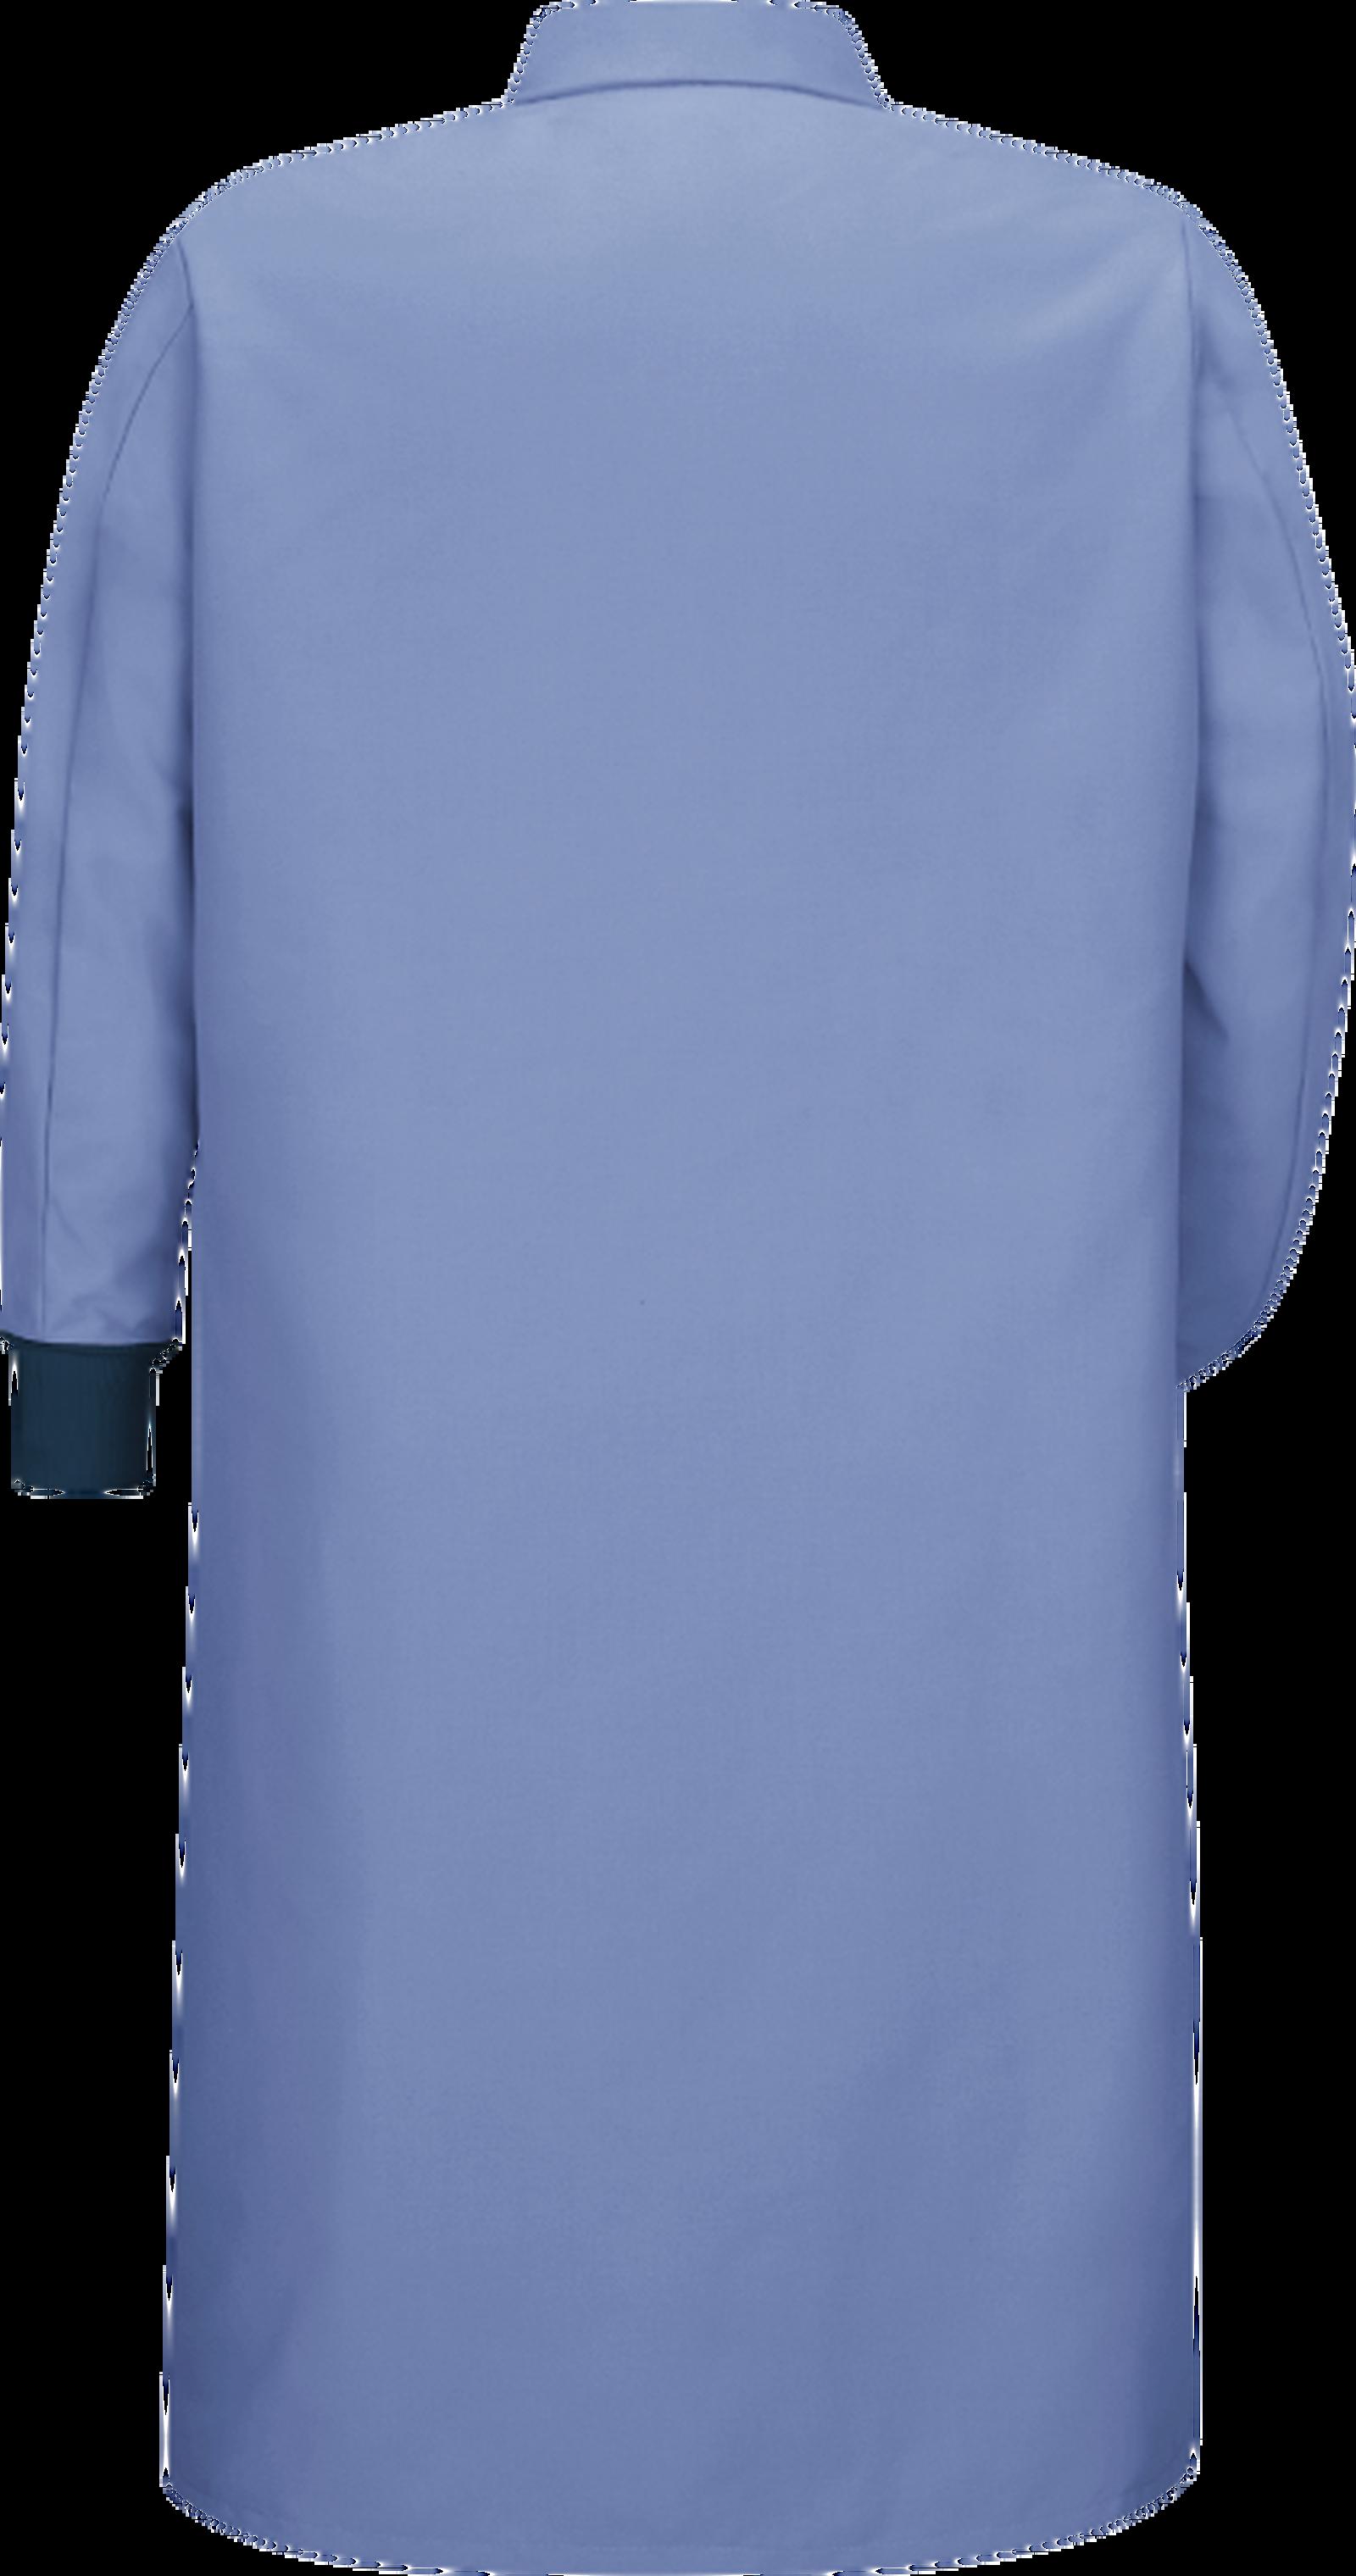 Gripper-Front Spun Polyester Pocketless Butcher Coatwith Knit Cuffs